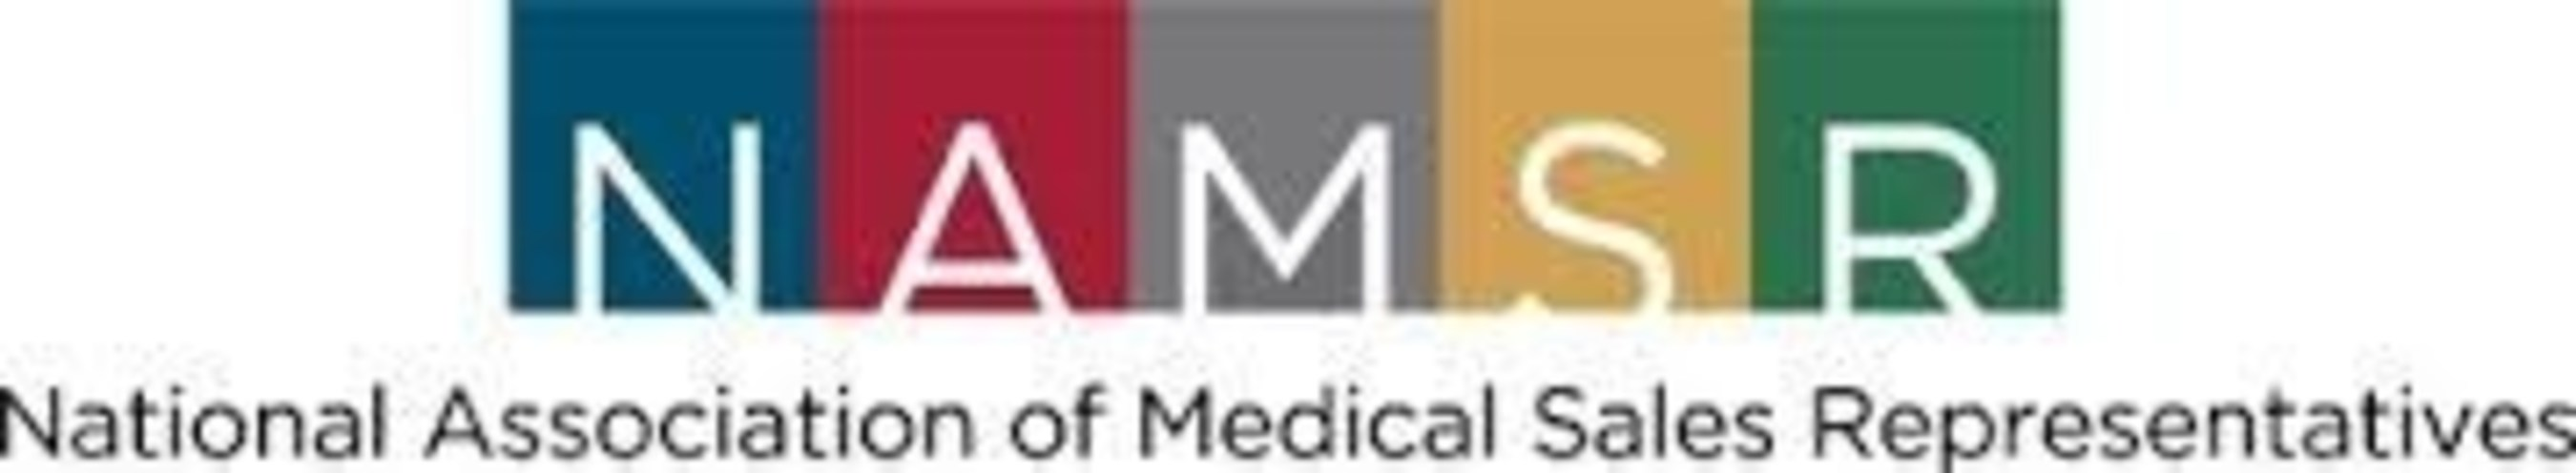 RMSR Medical Sales Training on Increase for Aspiring Medical Device Sales Candidates